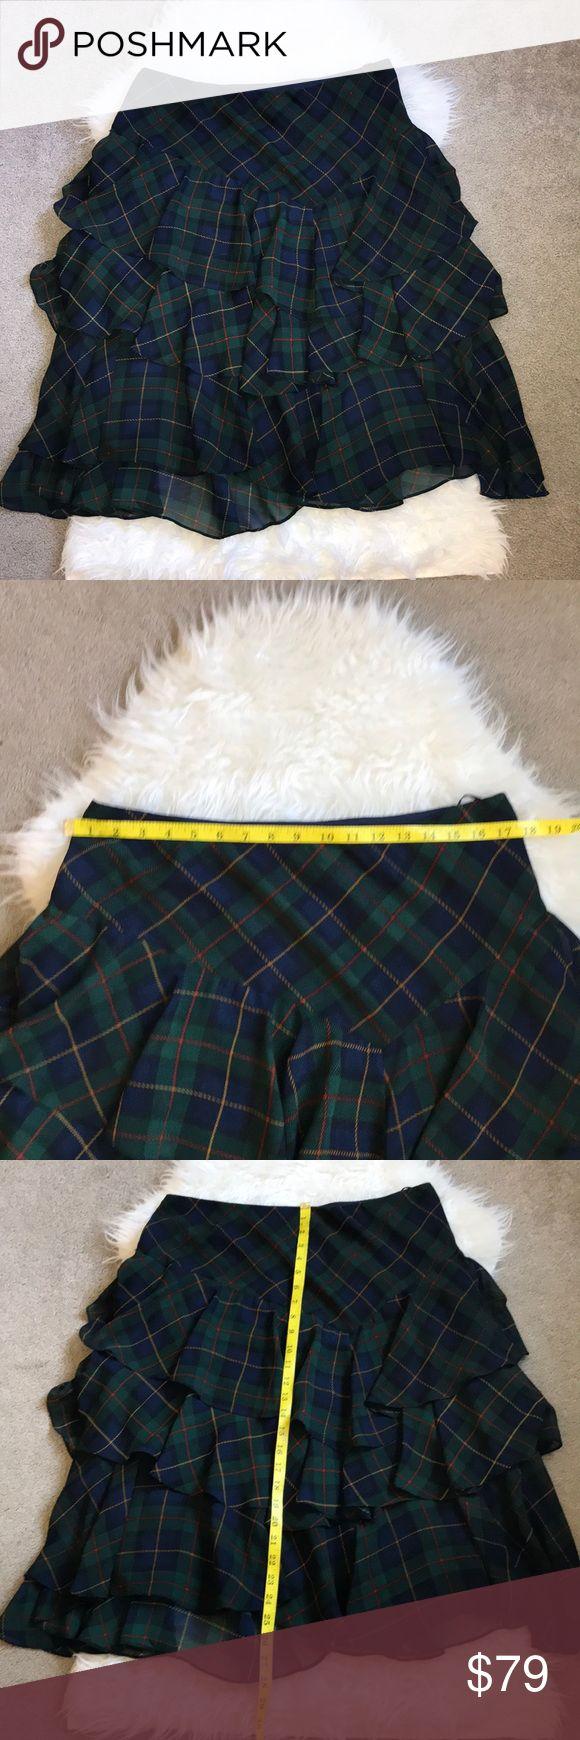 Ralph Lauren Skirt Size 10 Excellent condition 😍 NO TRADE 🚫 No model 💃🏻 Lauren Ralph Lauren Skirts Midi